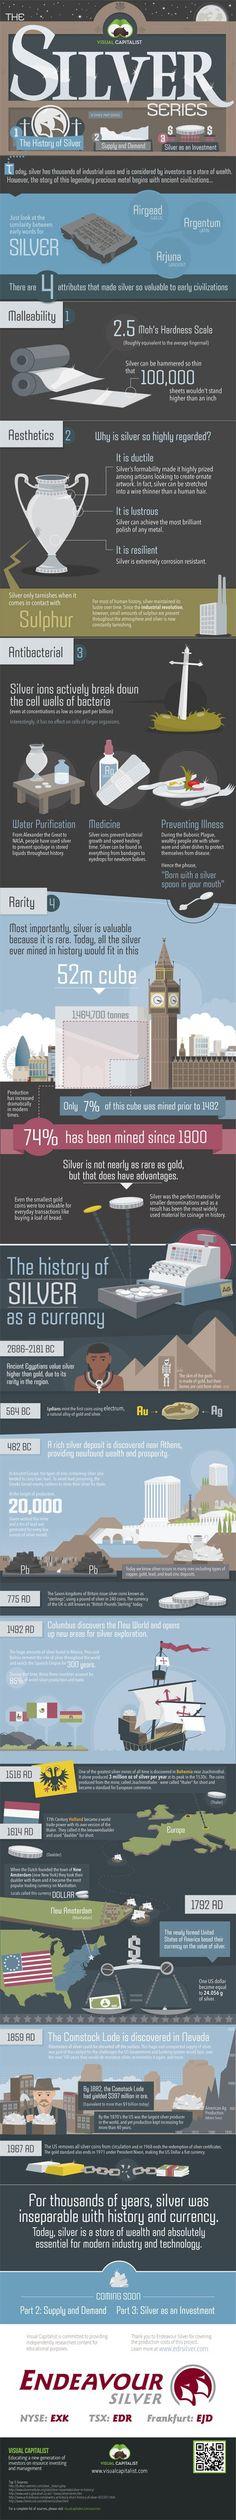 Historia de la plata. #infografia #infographic